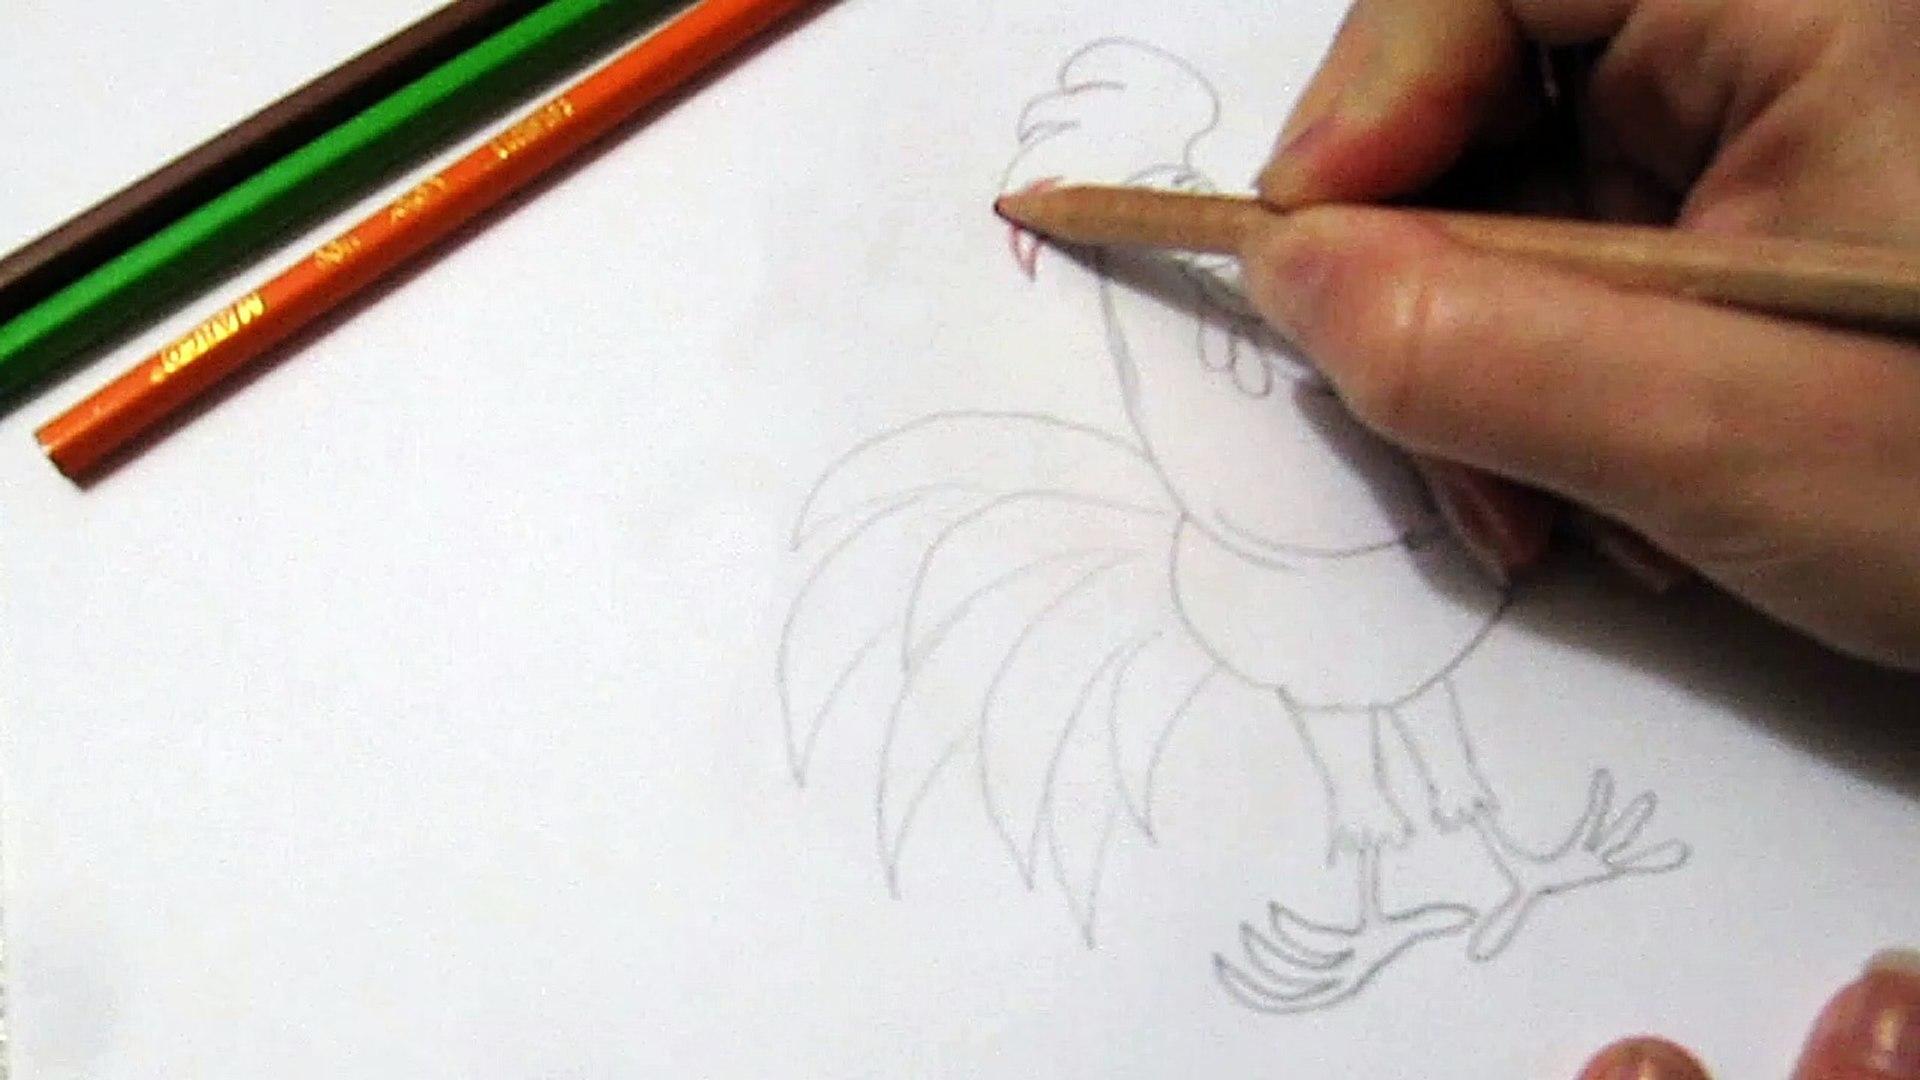 Как рисовать животного по гороскопу 2017 Петух How to Draw an animal horoscope Rooster 2017